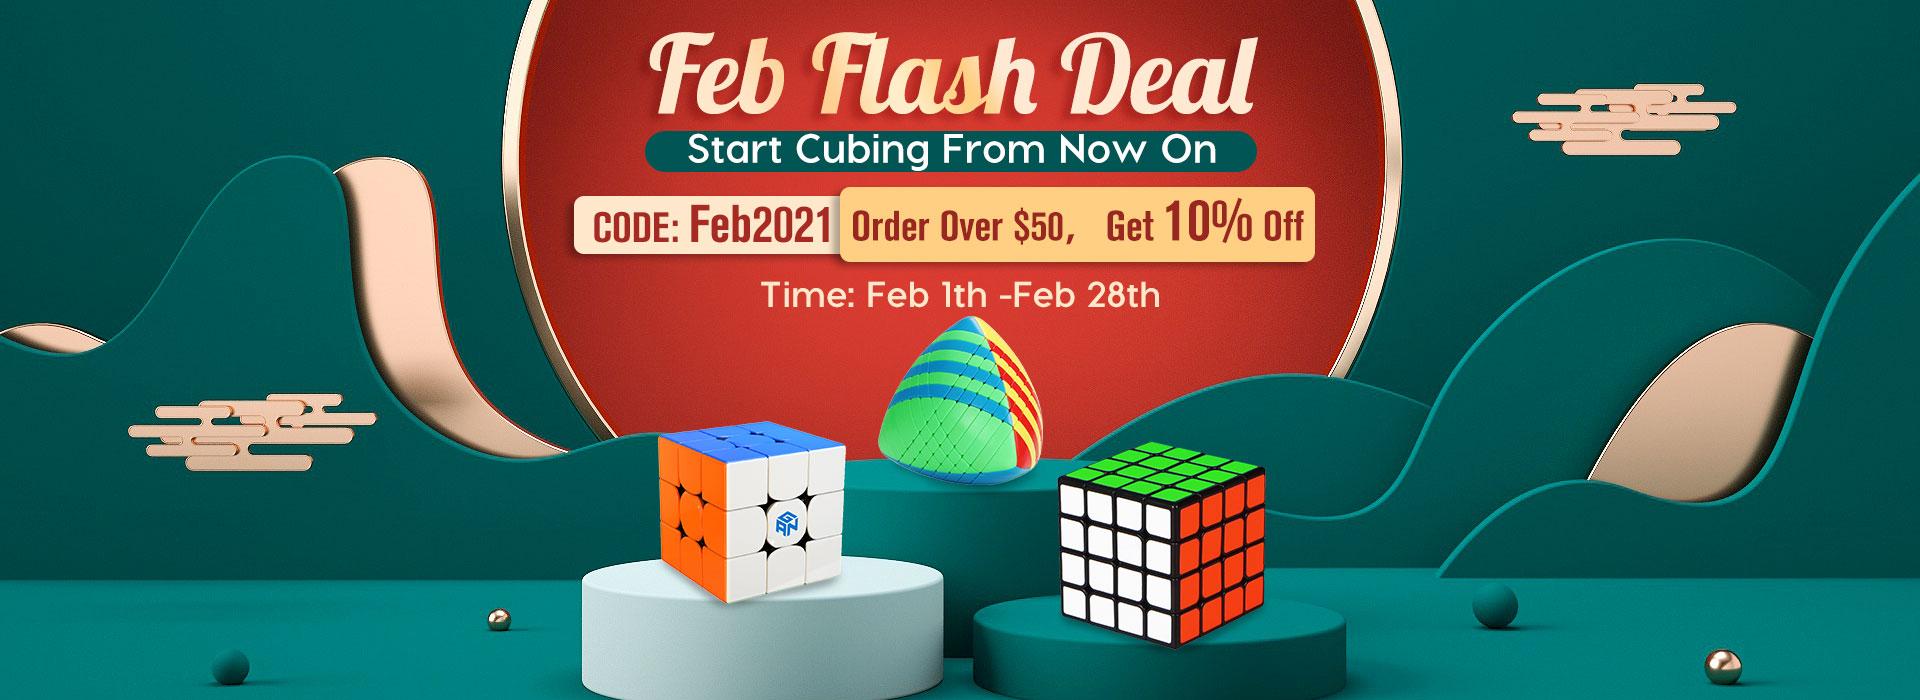 lightake.com - Feb Flash Deal